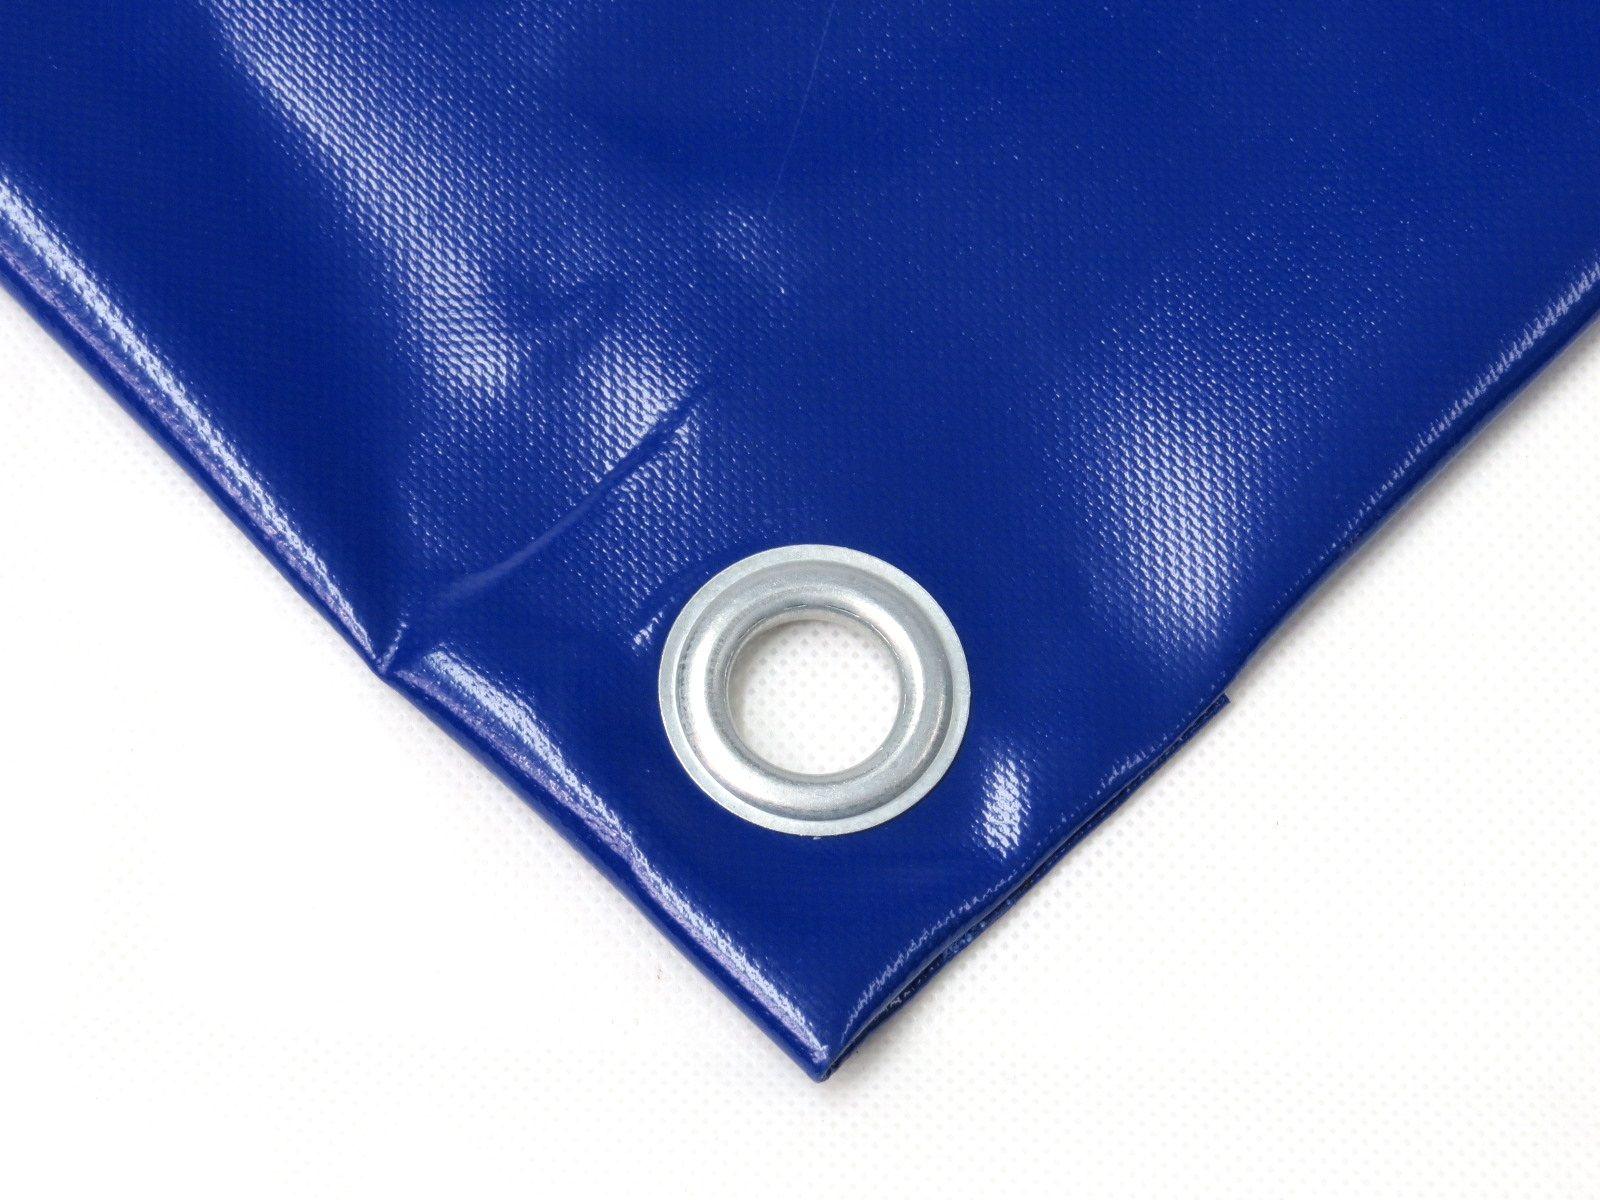 pvc plane gewebeplane 650 g m blau 36 05 tvv. Black Bedroom Furniture Sets. Home Design Ideas